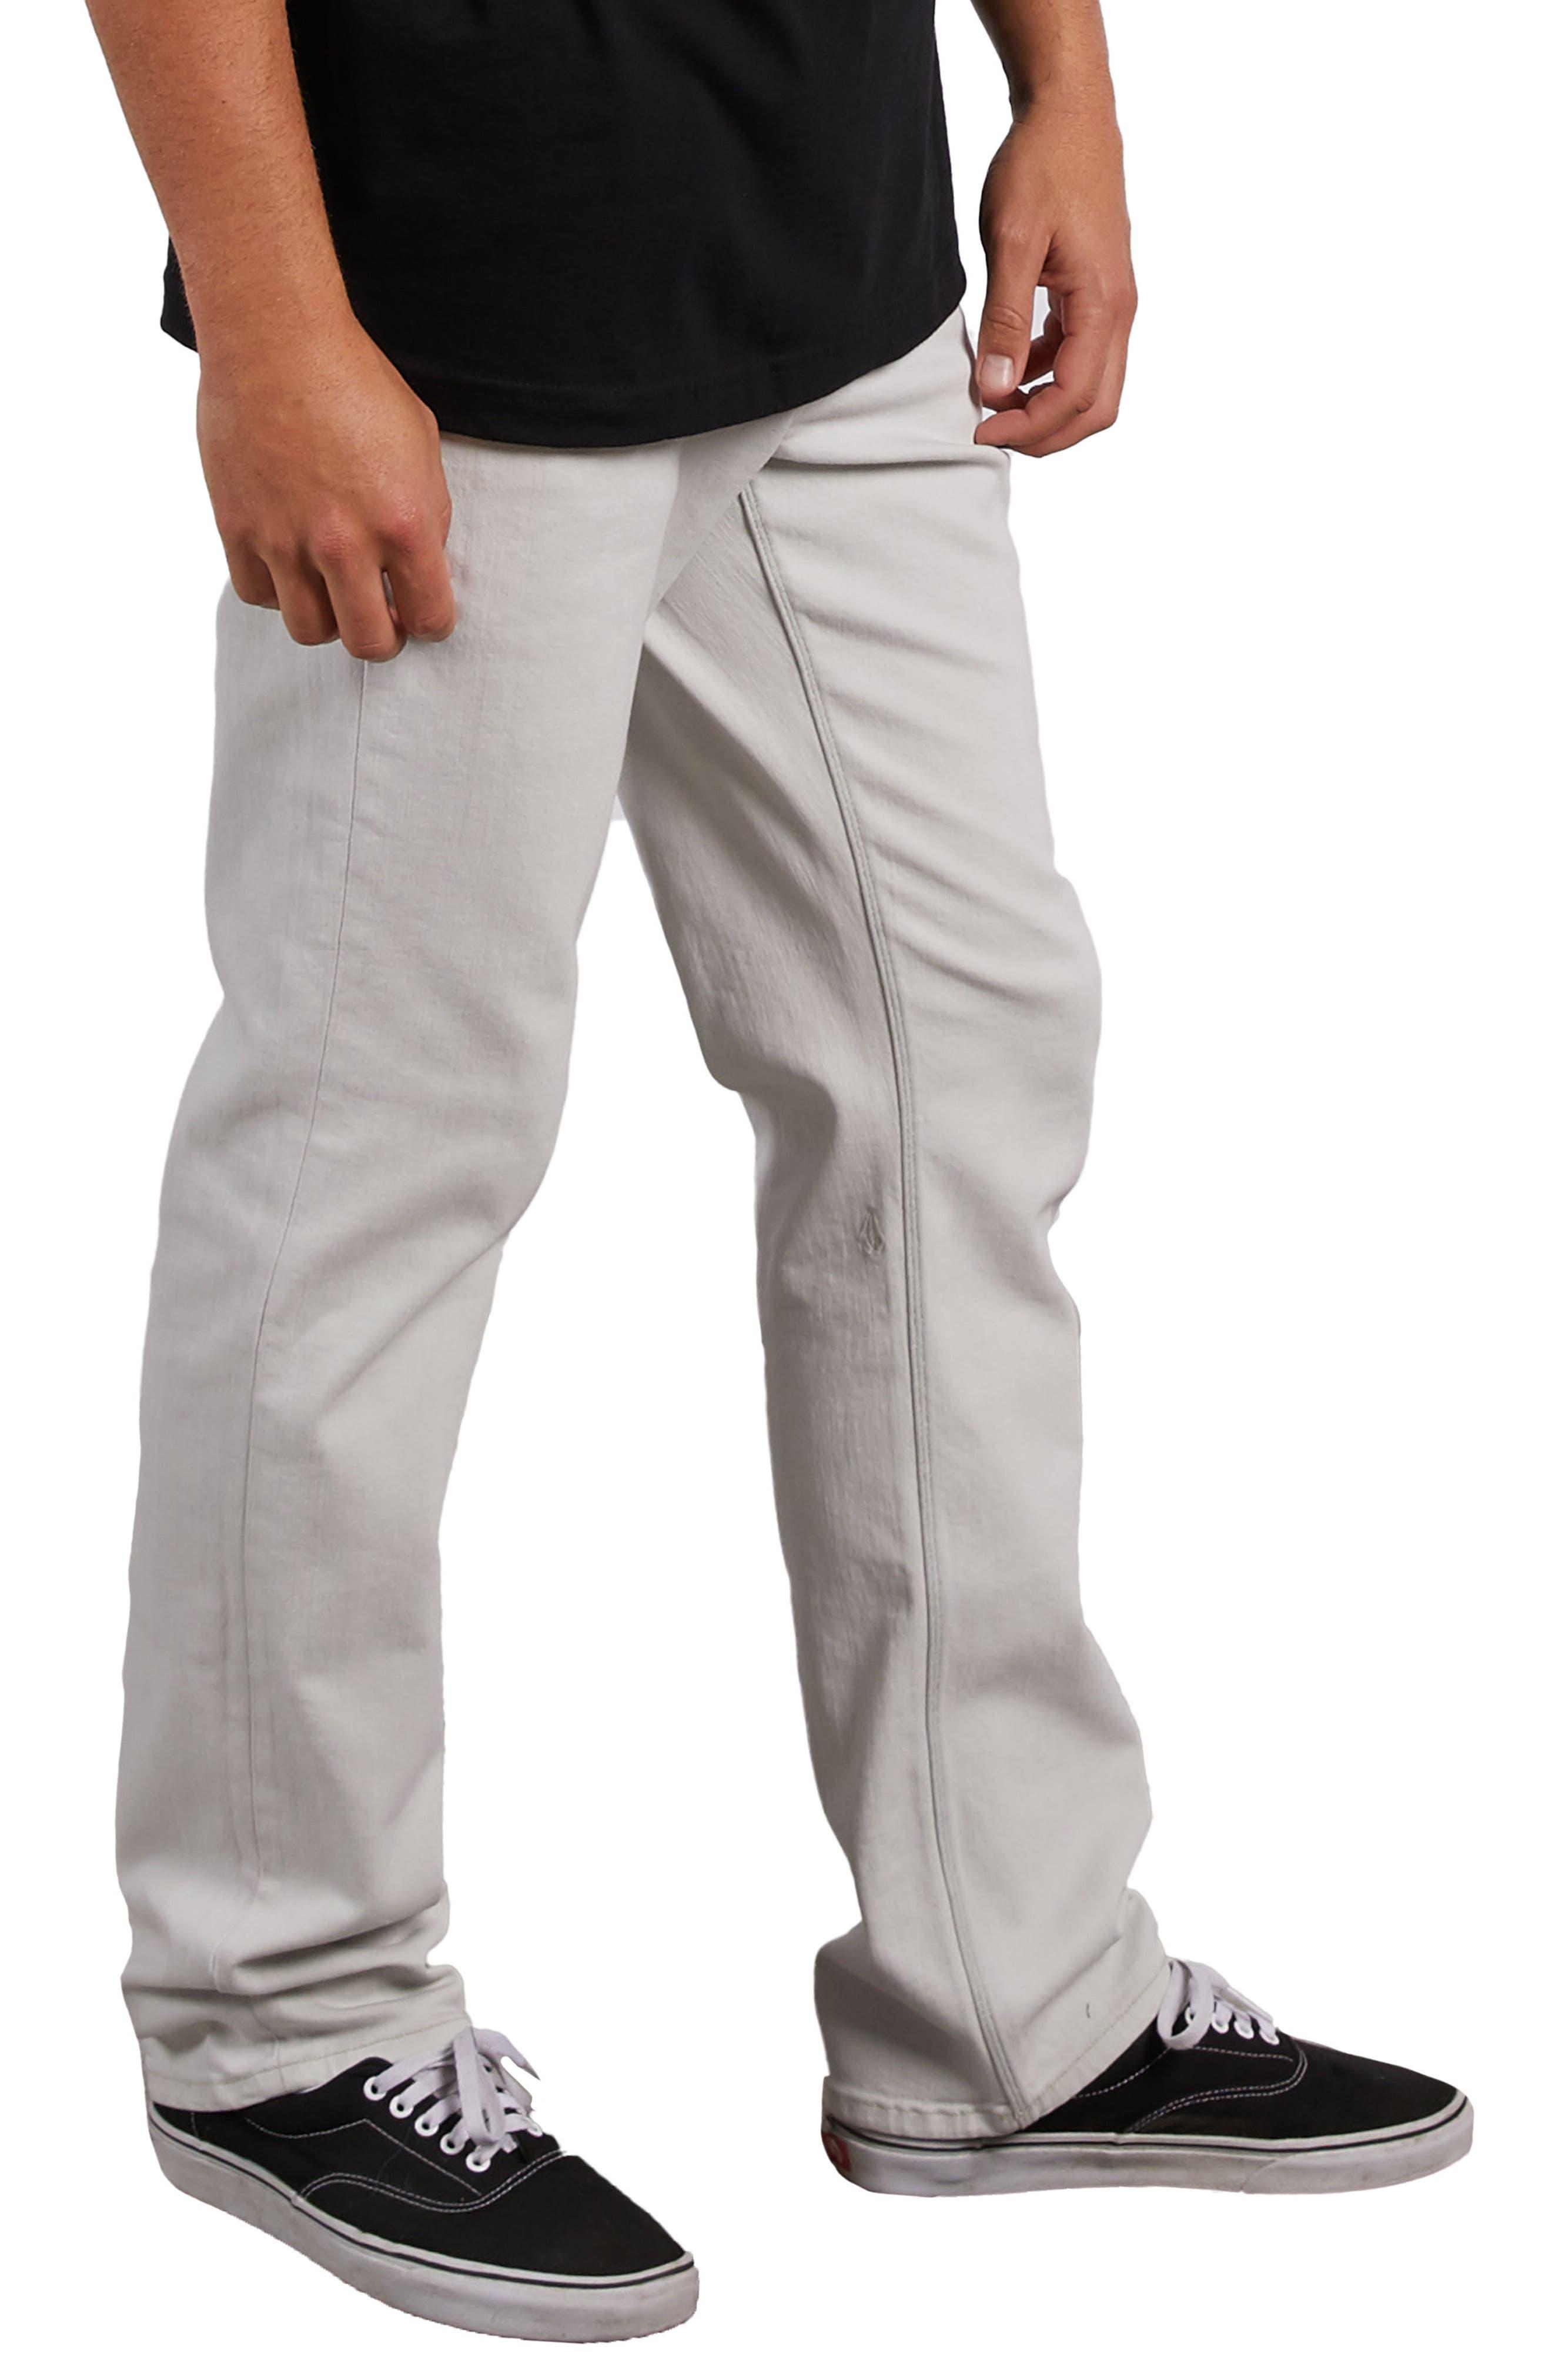 Solver Straight Leg Jeans,                             Alternate thumbnail 3, color,                             DIRTY WHITE